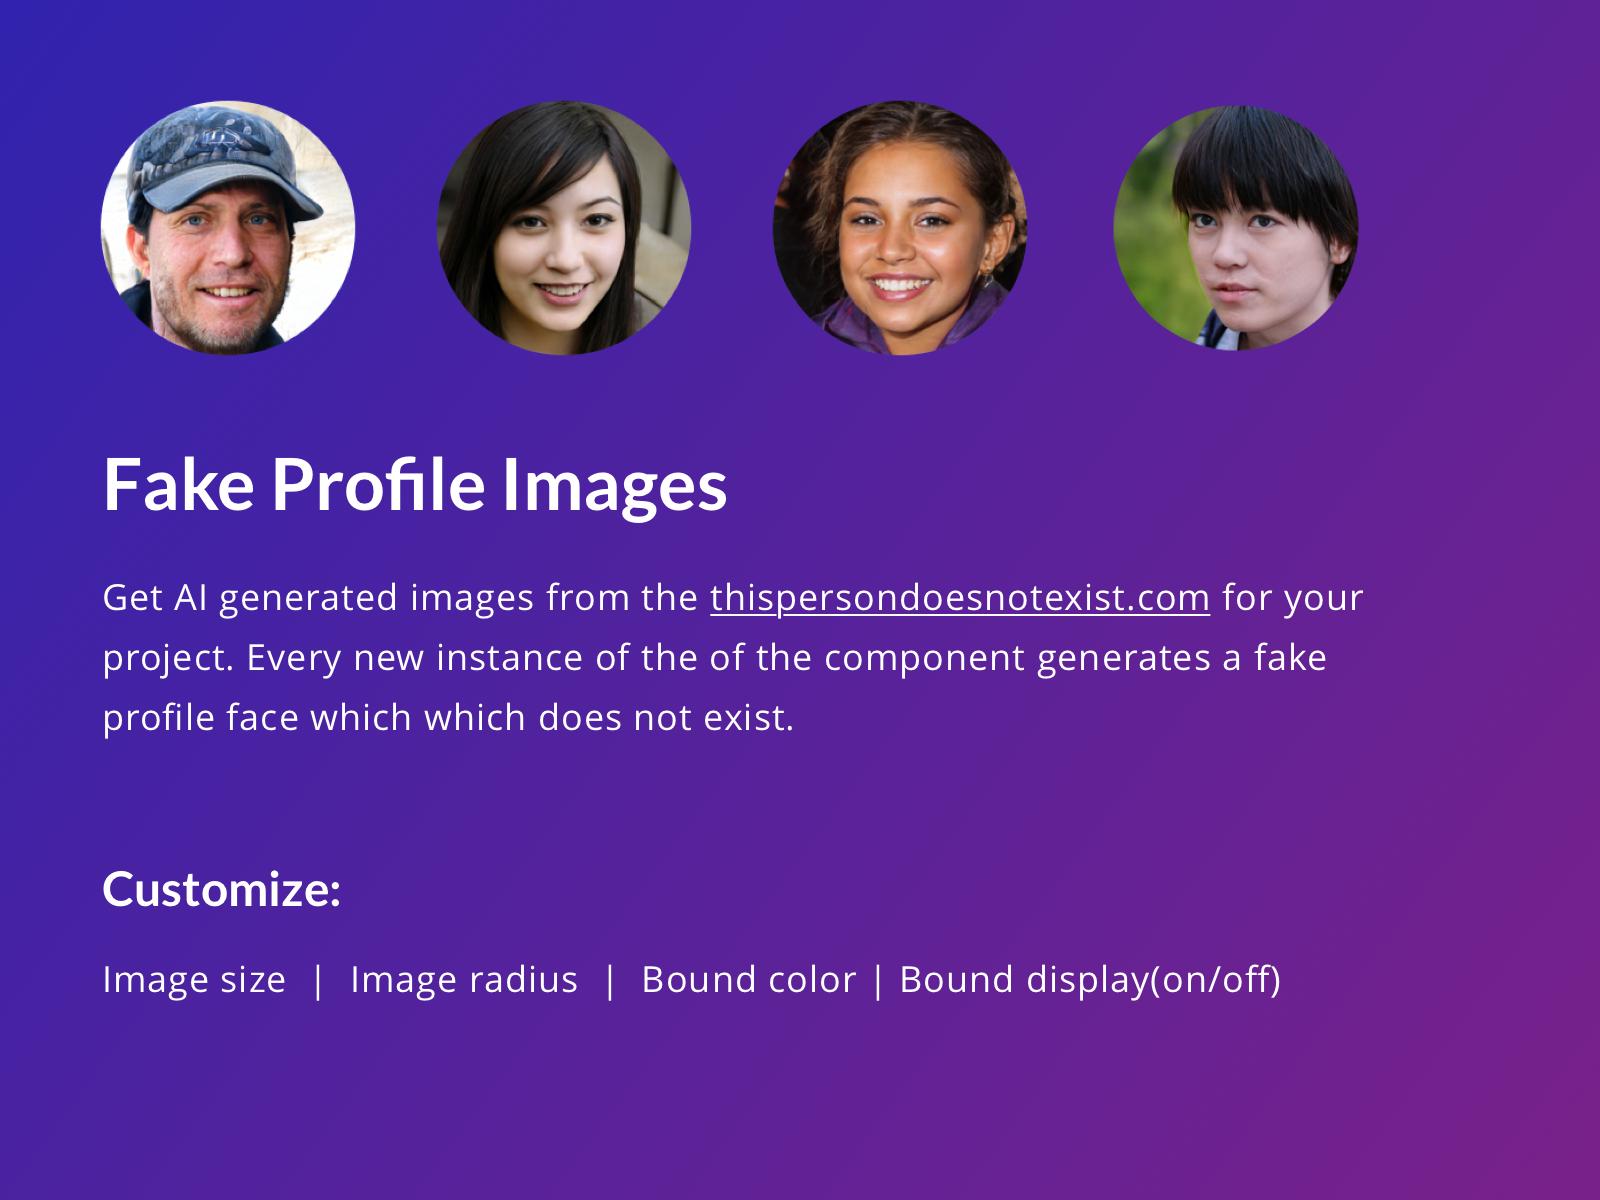 Fake Profile Image